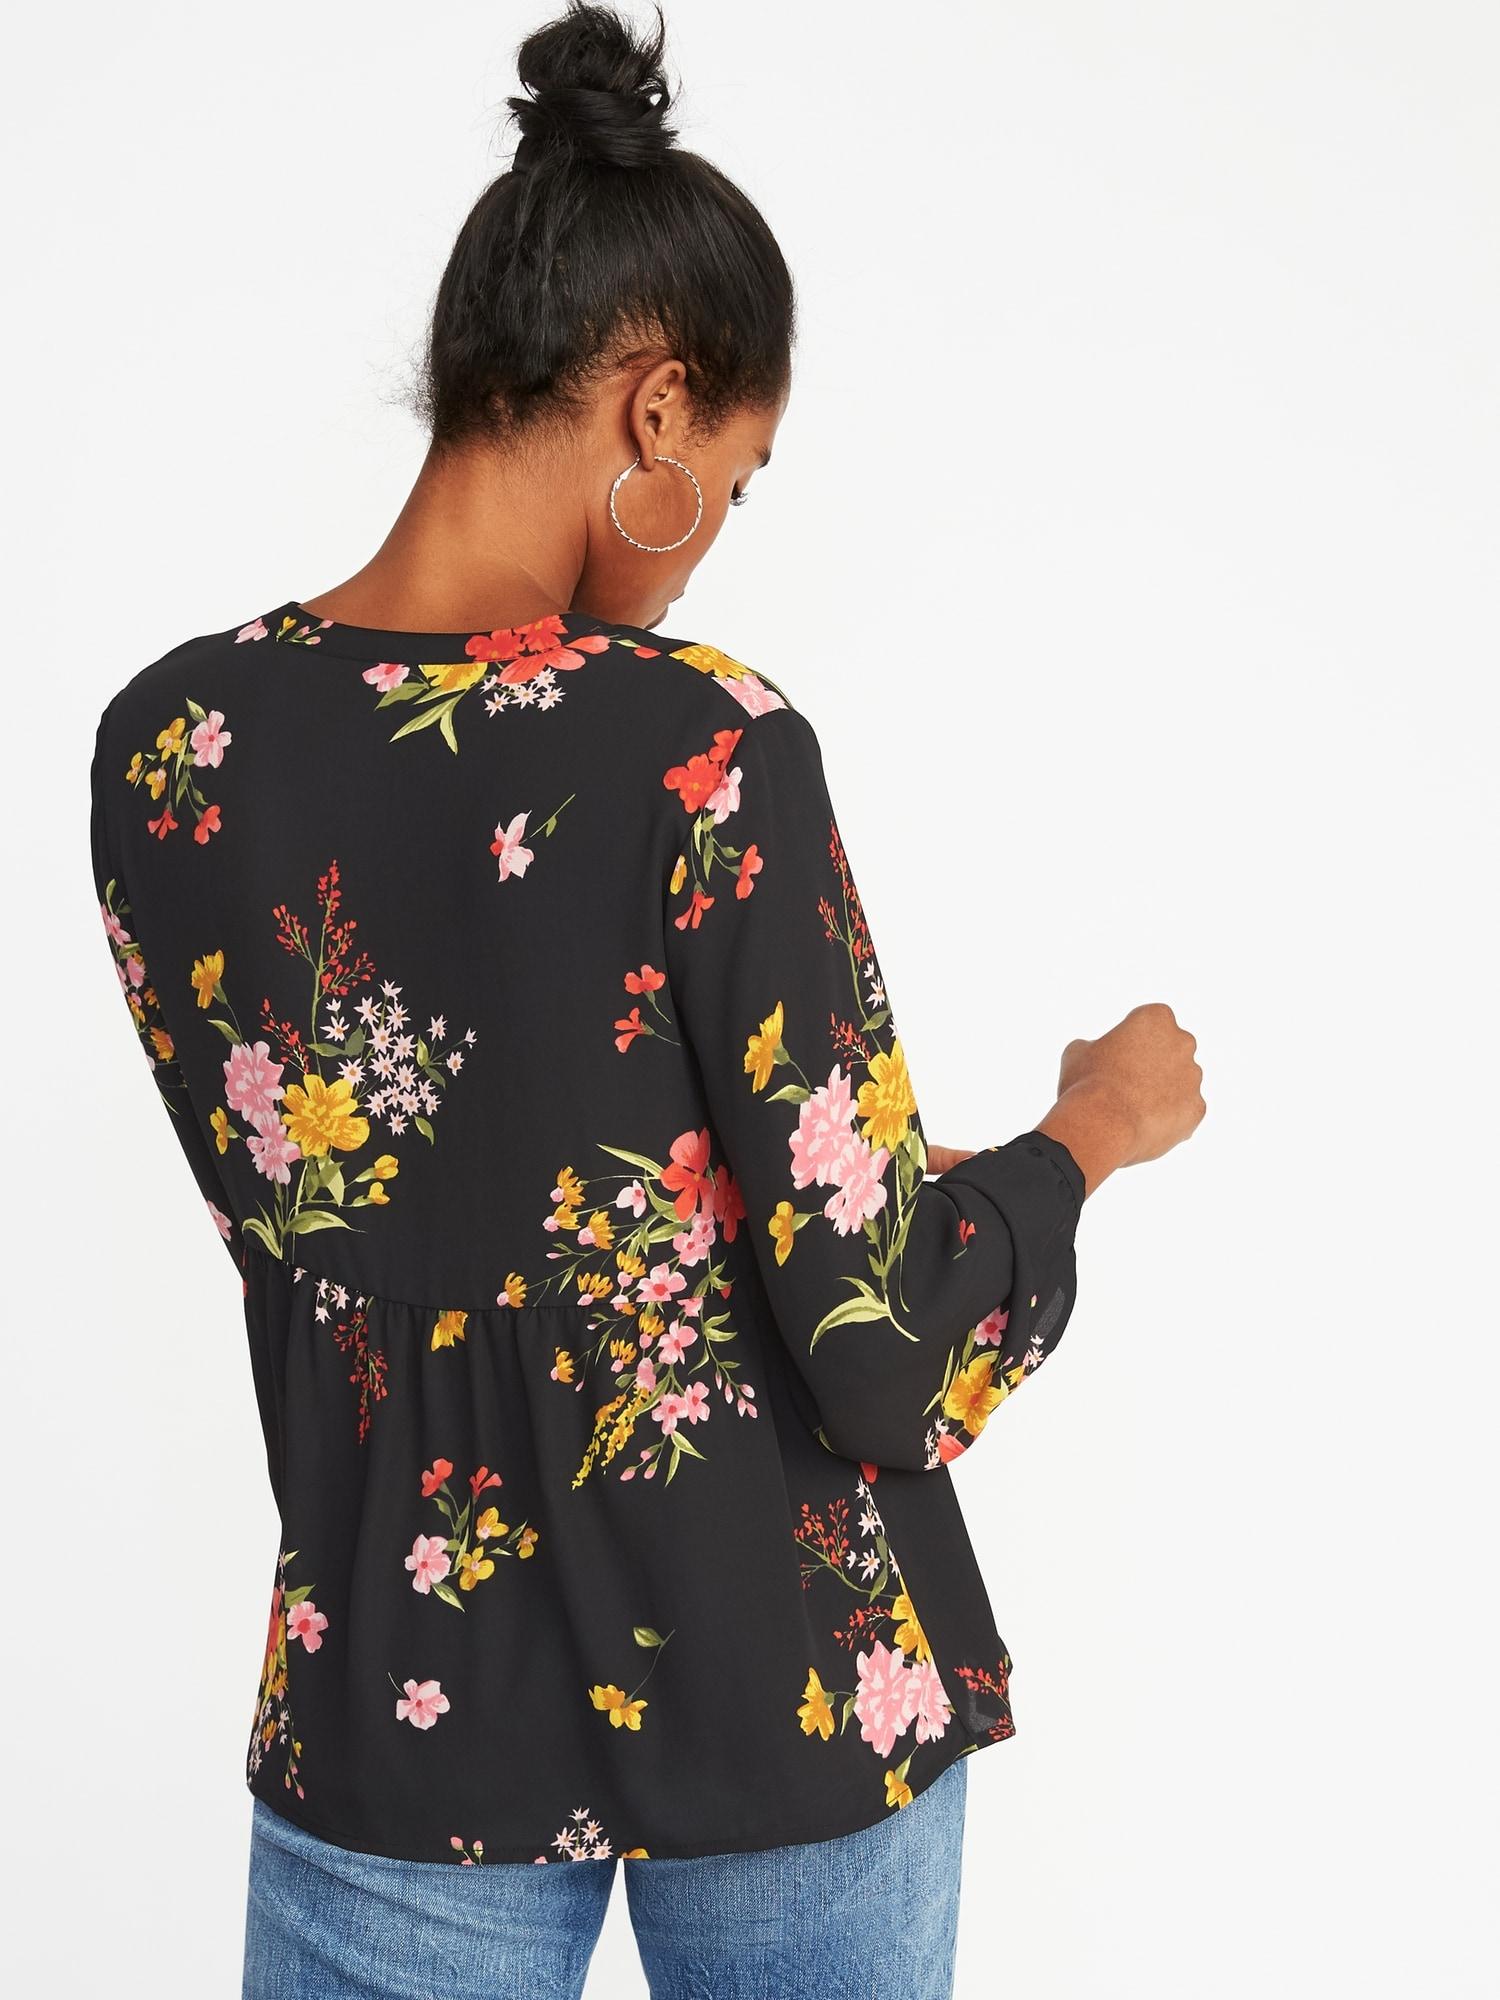 Floral Print Georgette Swing Blouse For Women Old Navy Mom N Bab Girl Set Blue Flower Size 12m